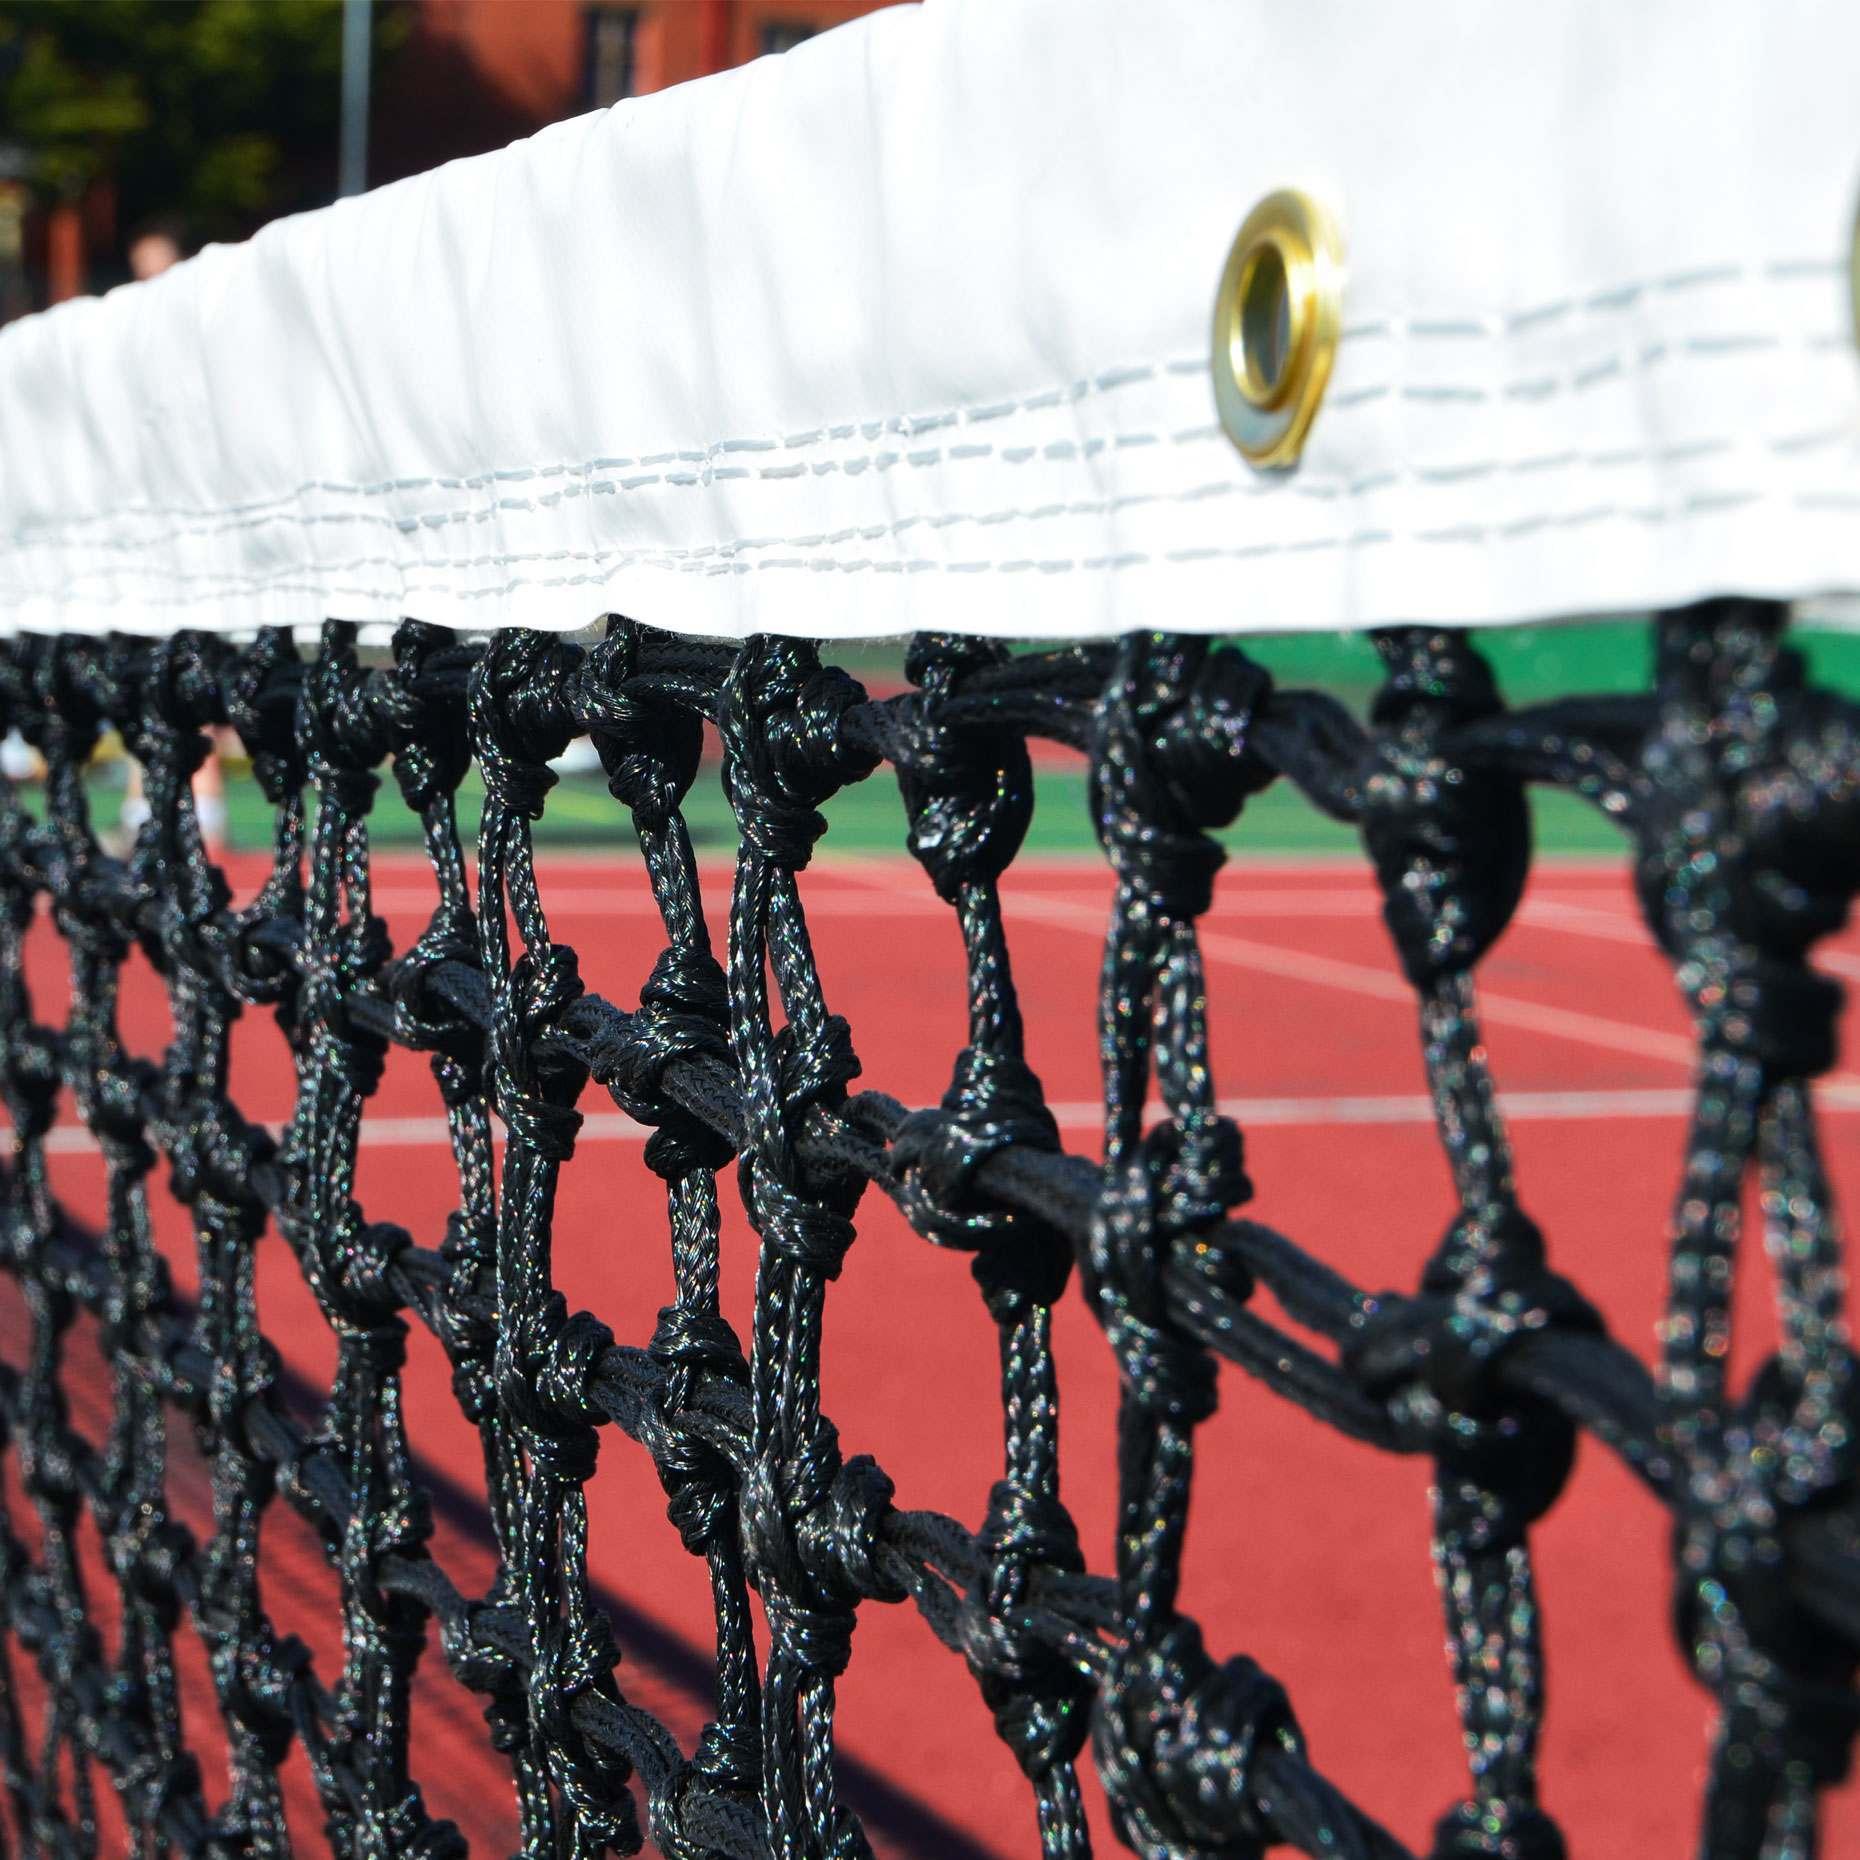 3.5mm DT Championship Tennis Net Banding & Eyelets